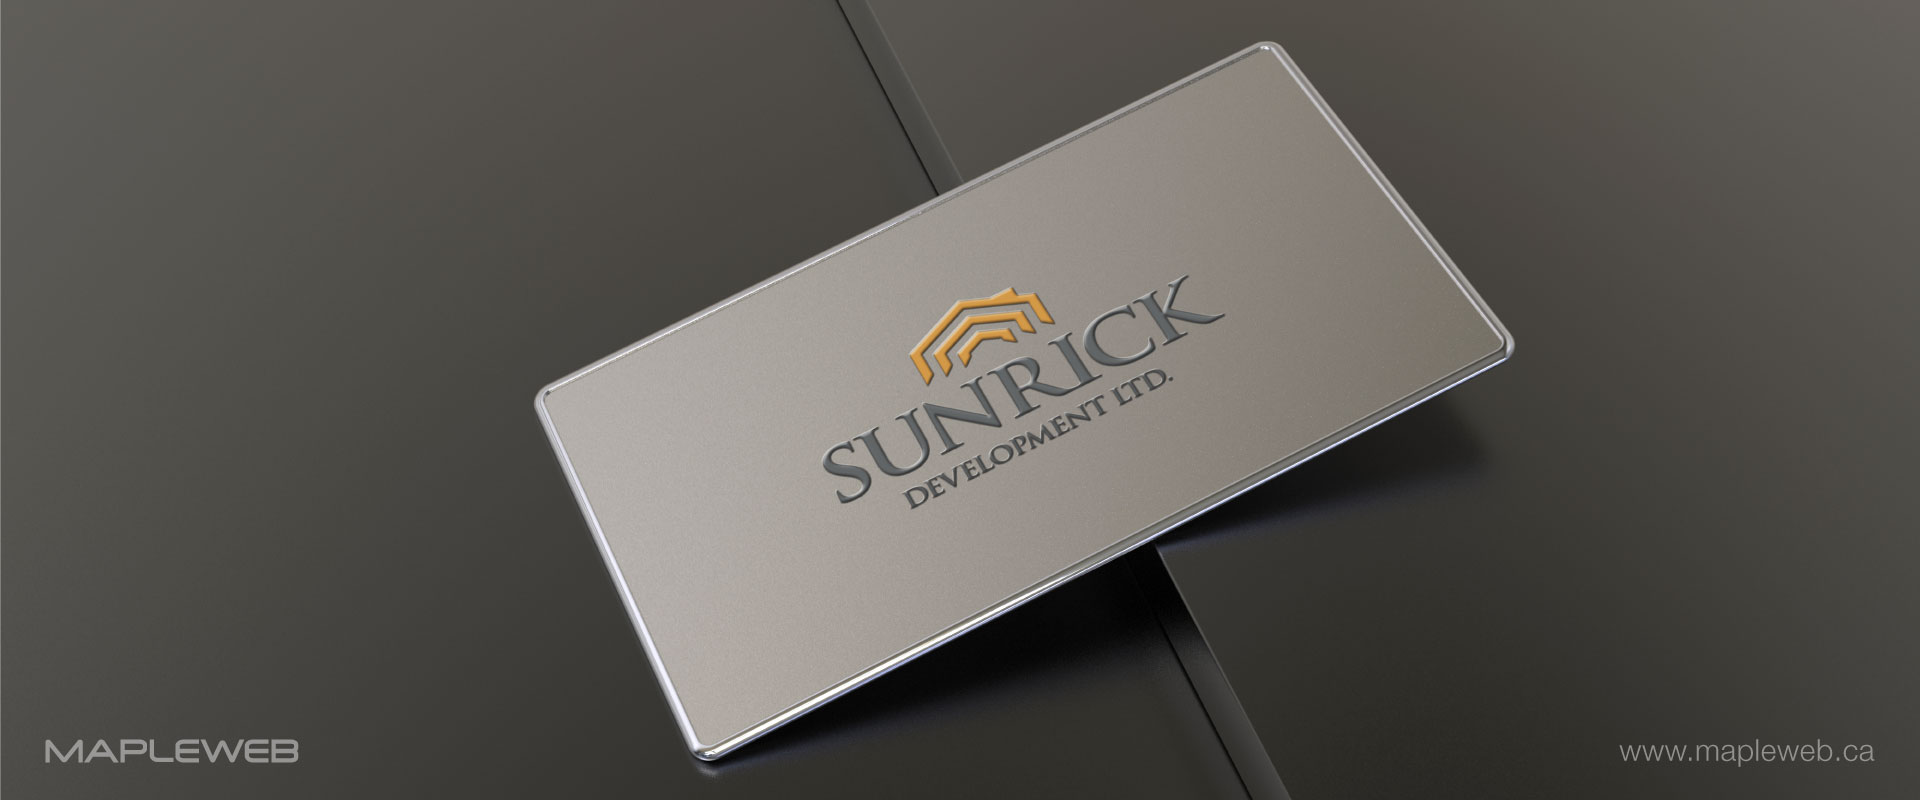 sunrick-development-ltd-brand-logo-design-by-mapleweb-vancouver-canada-business-card-mock